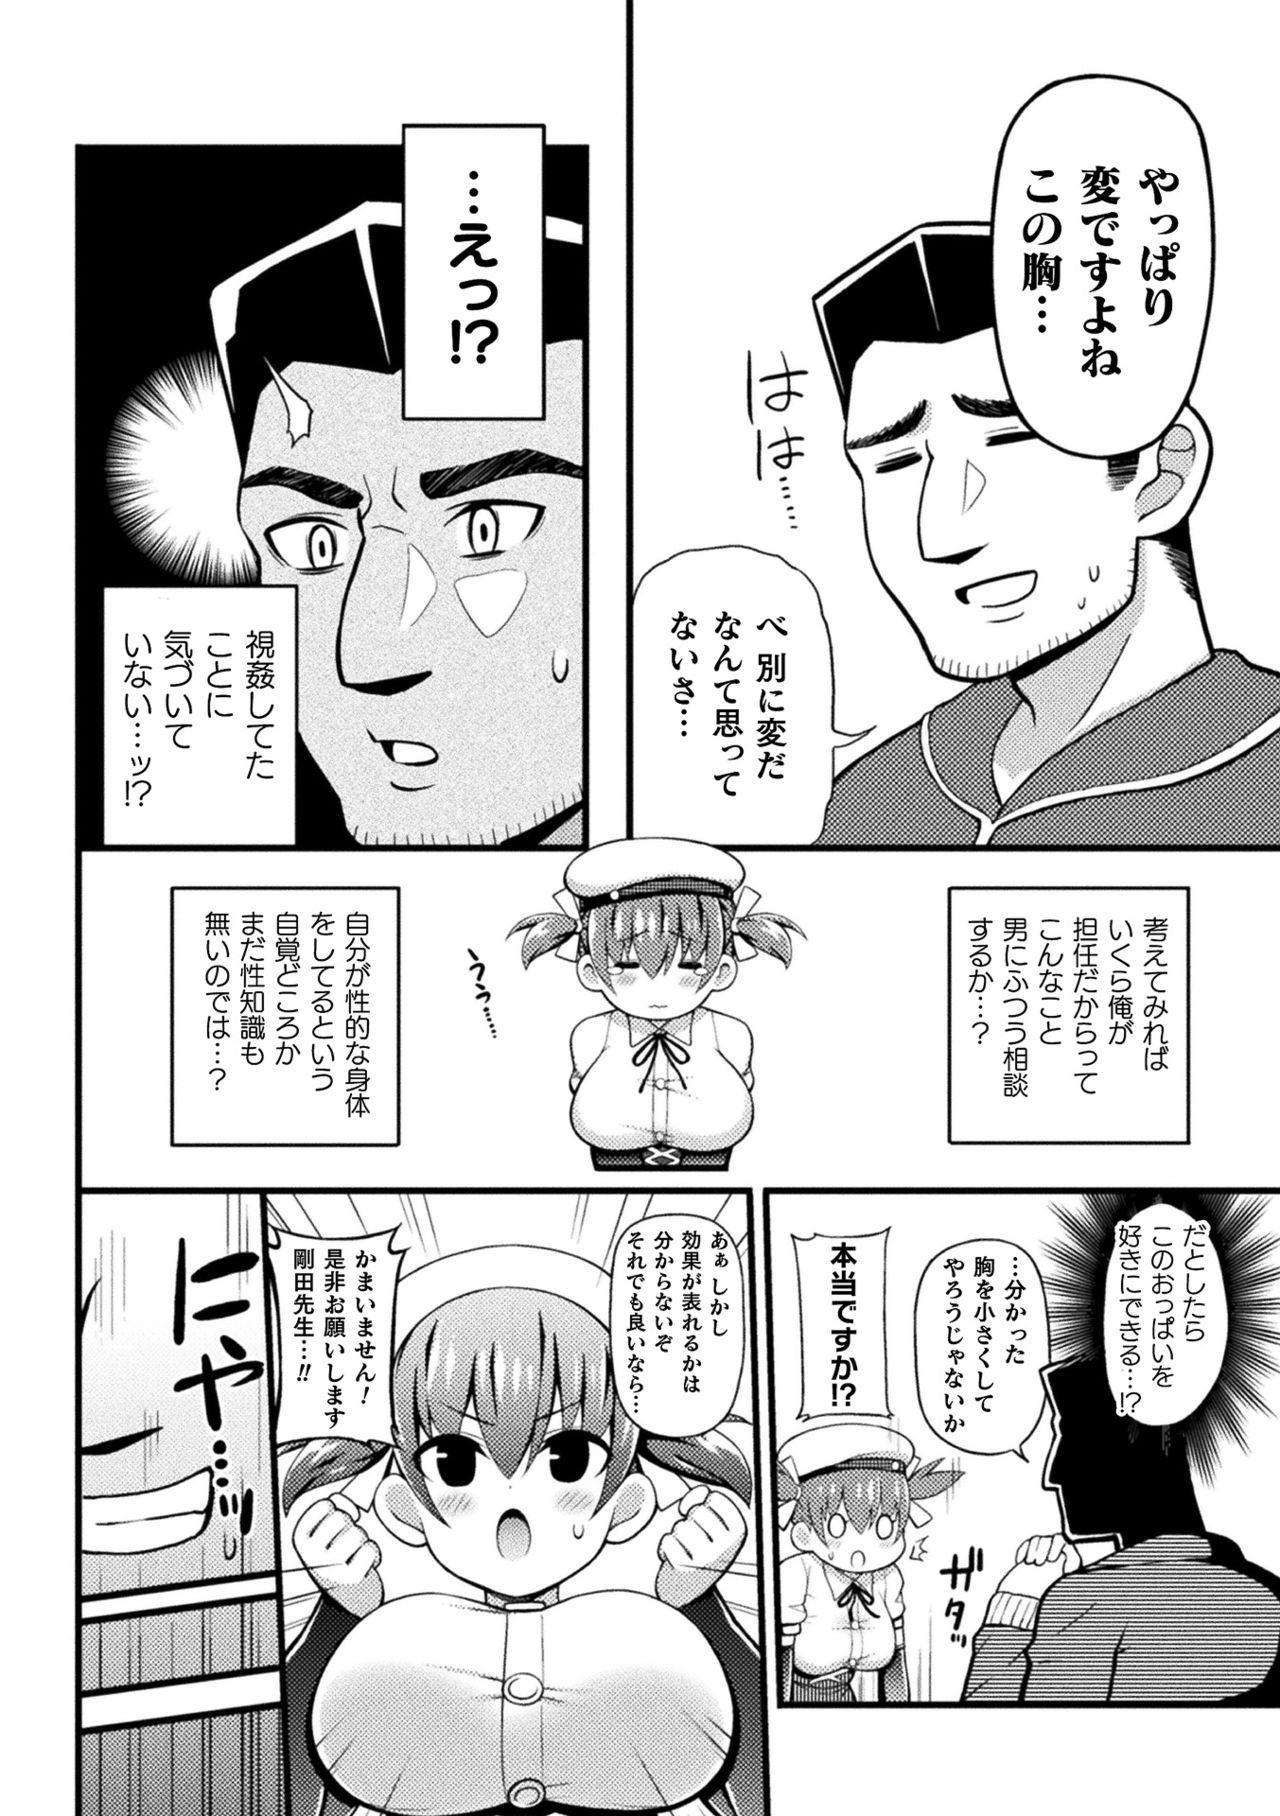 2D Comic Magazine Ero Chishiki 0 na Heroine Damashite Ryoujoku Muchix! Vol. 1 45